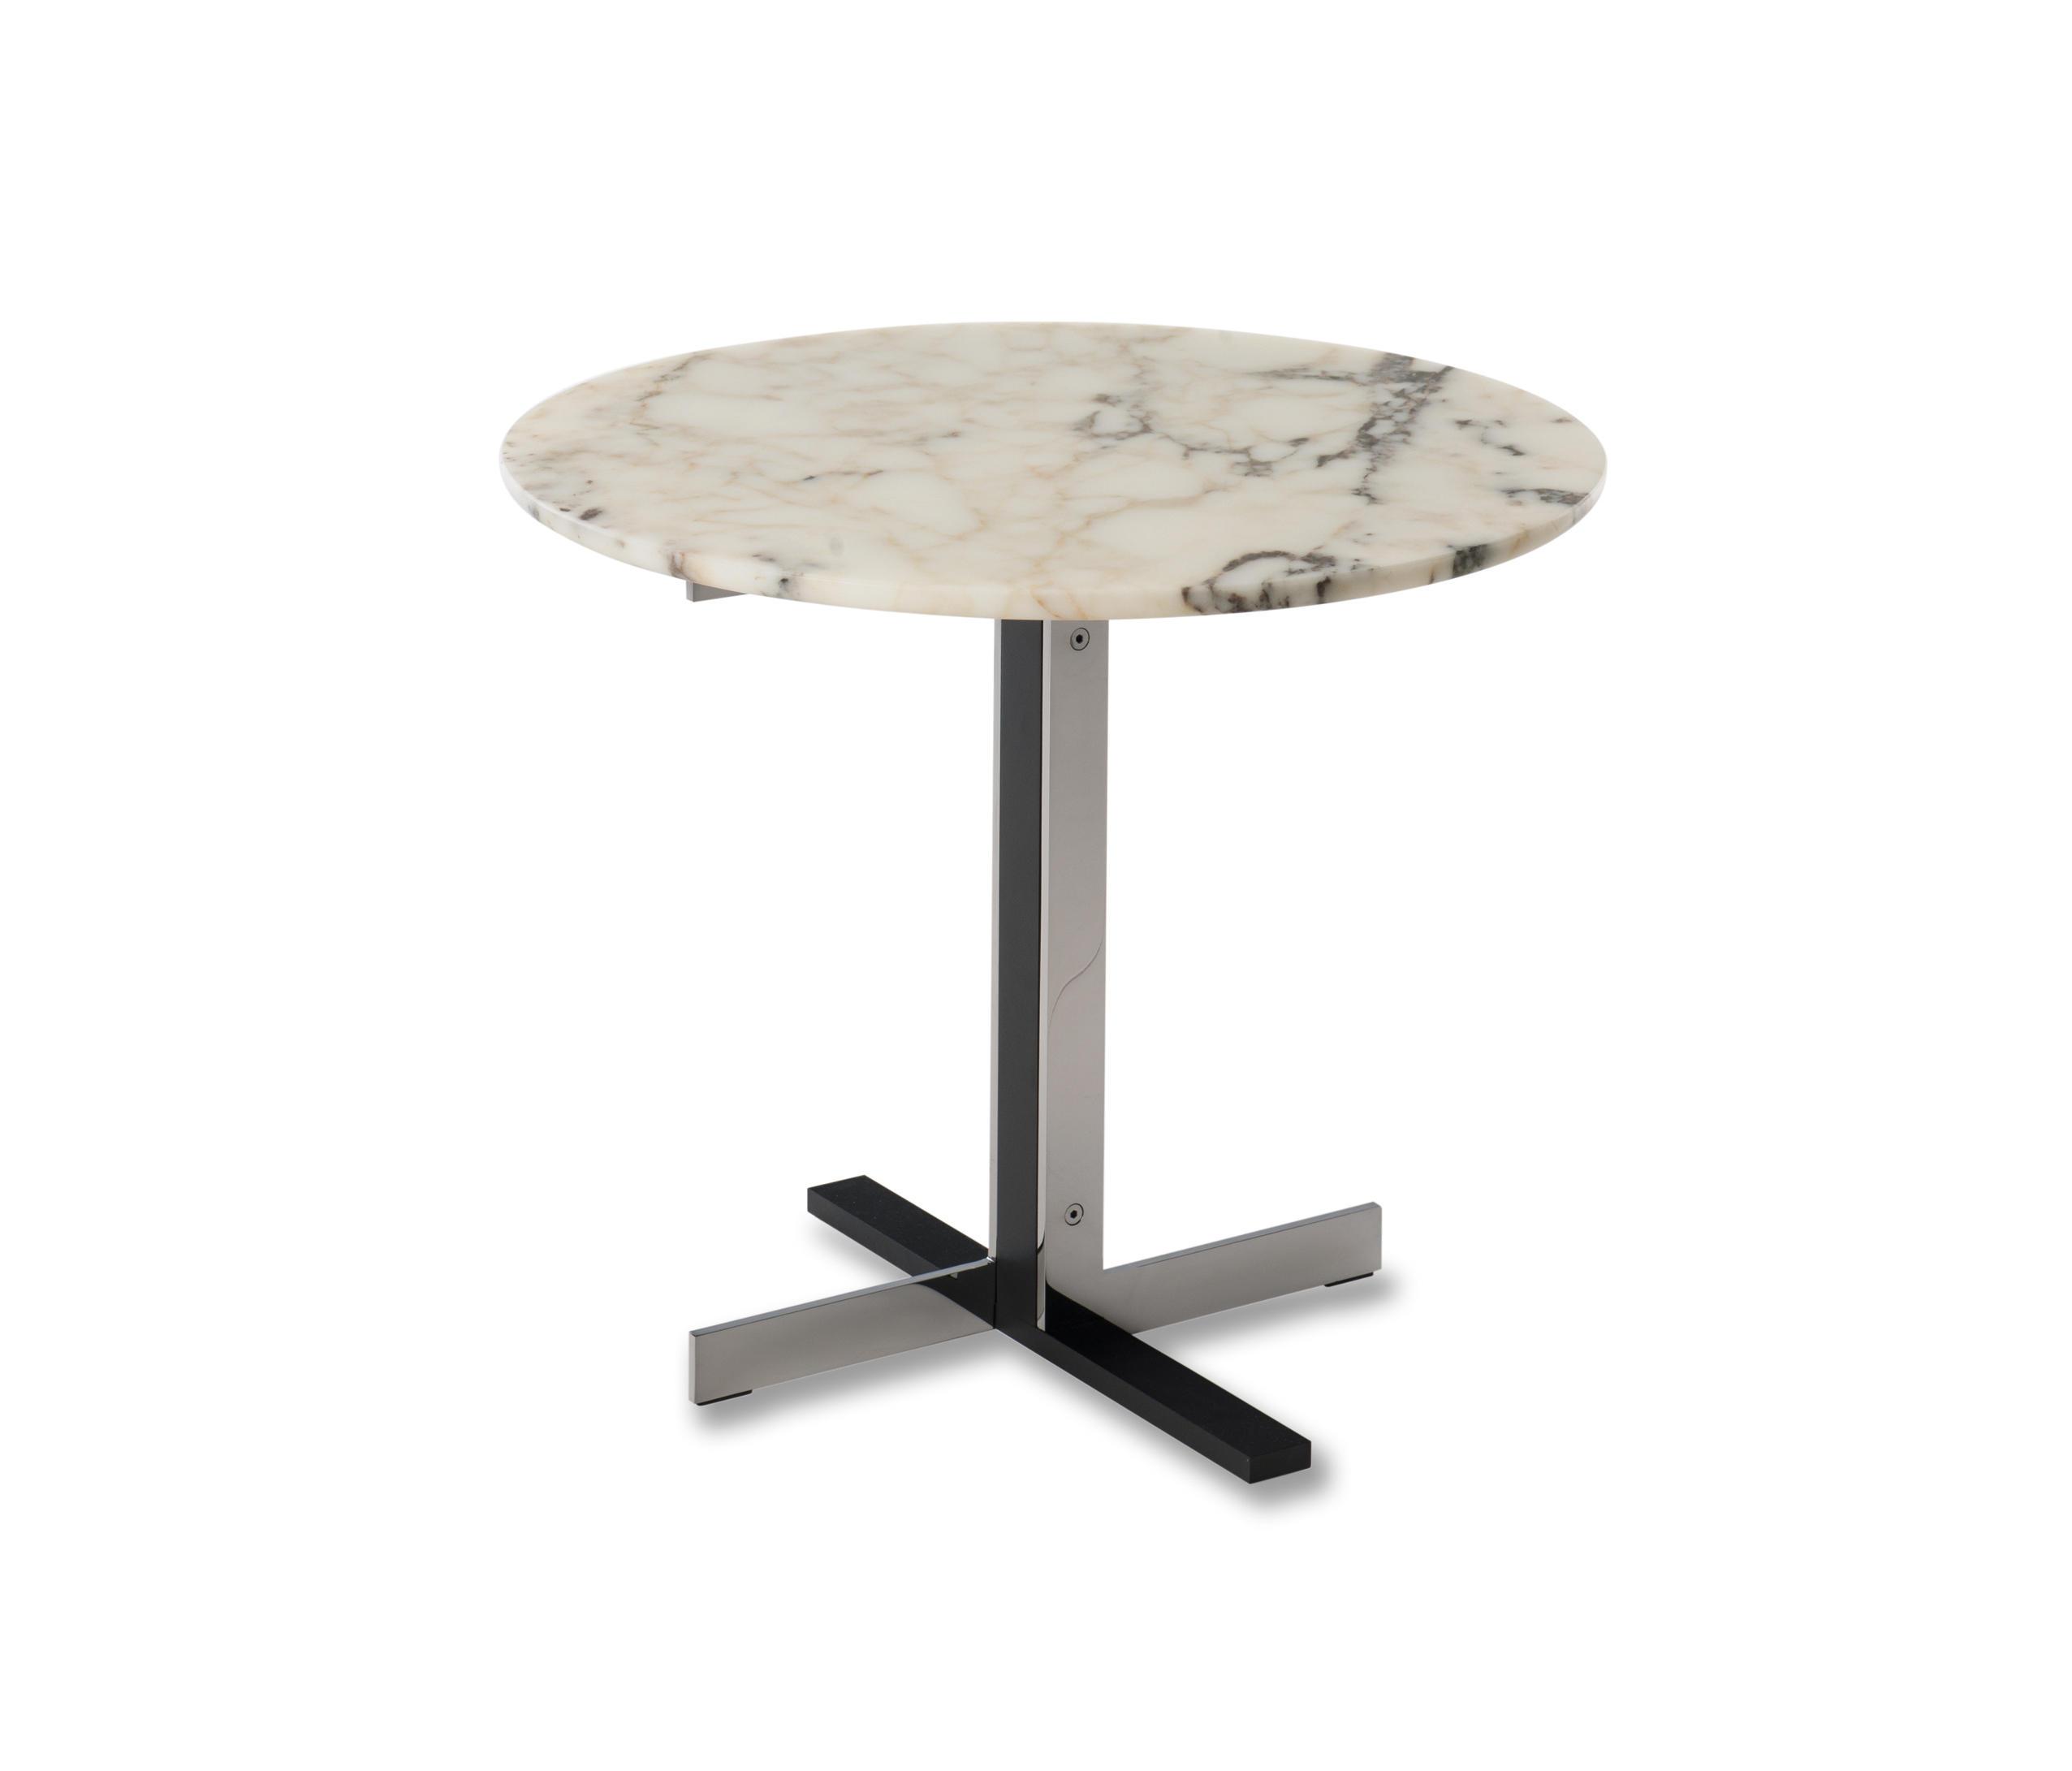 CATLIN Side tables from Minotti